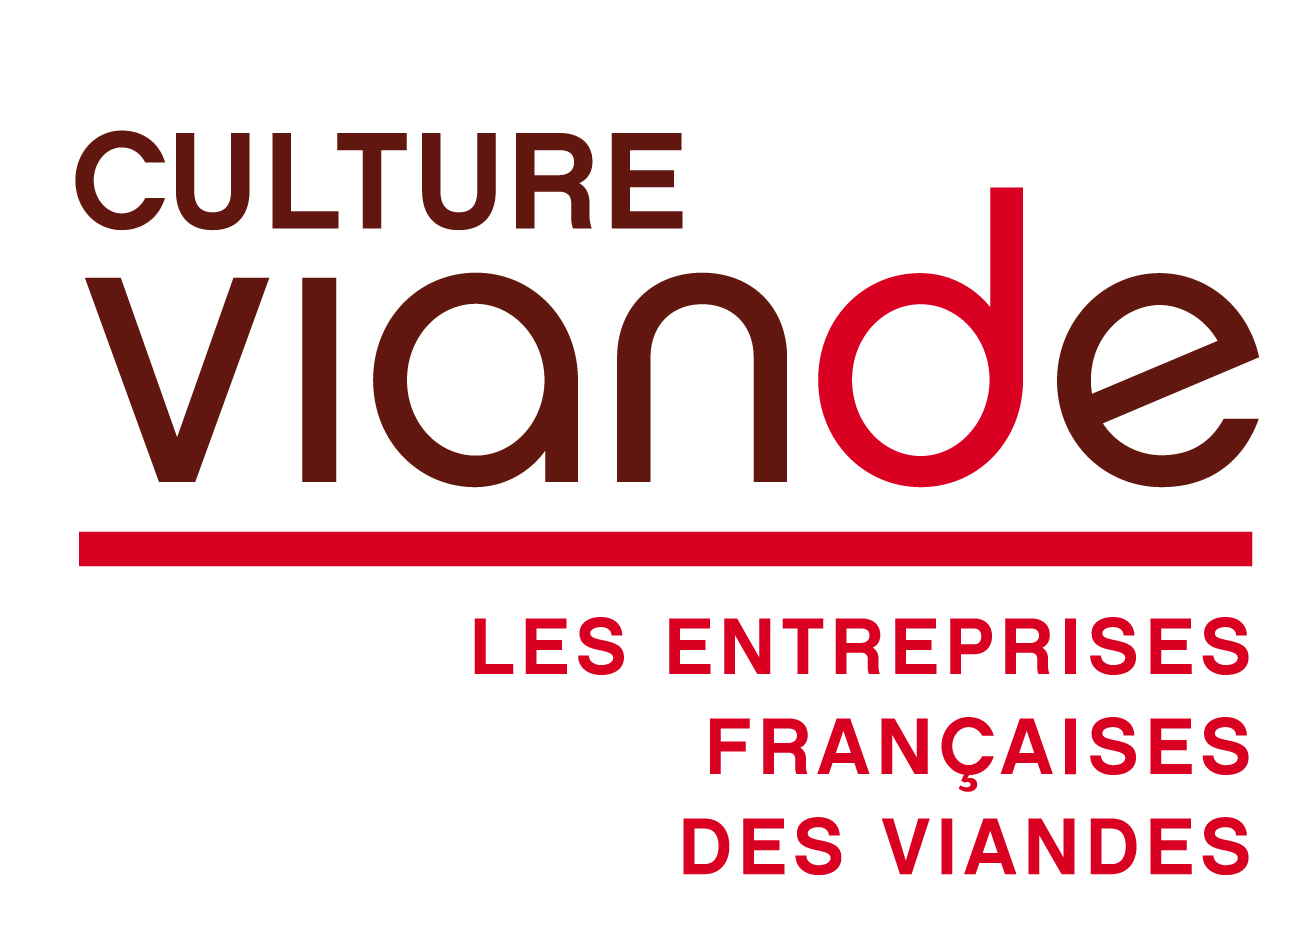 logo-cultureviande